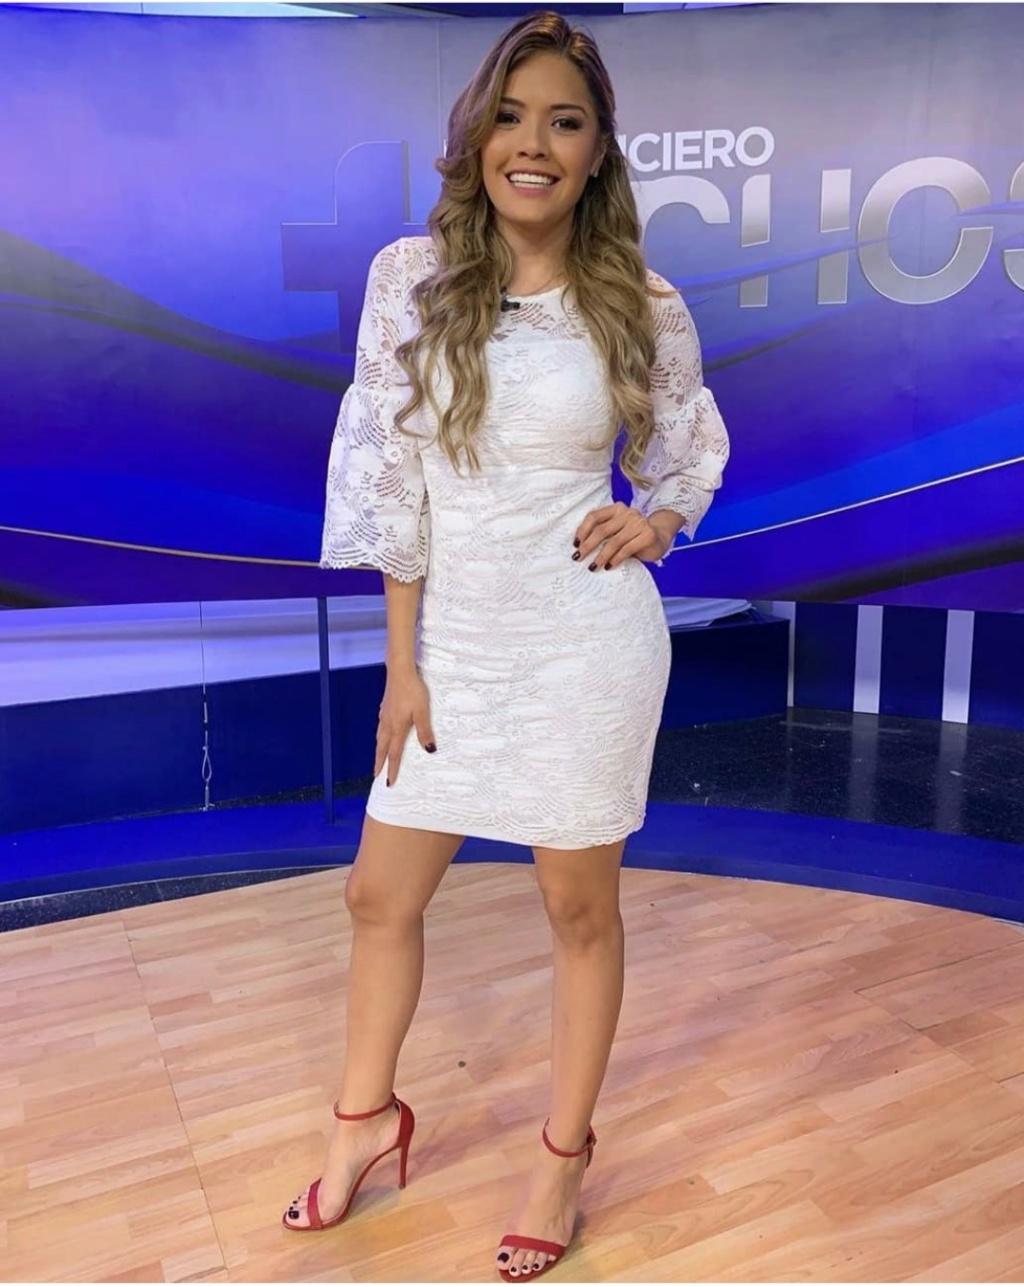 ¿Cuánto mide Zully Rodríguez? - Altura - Real height Img_1541